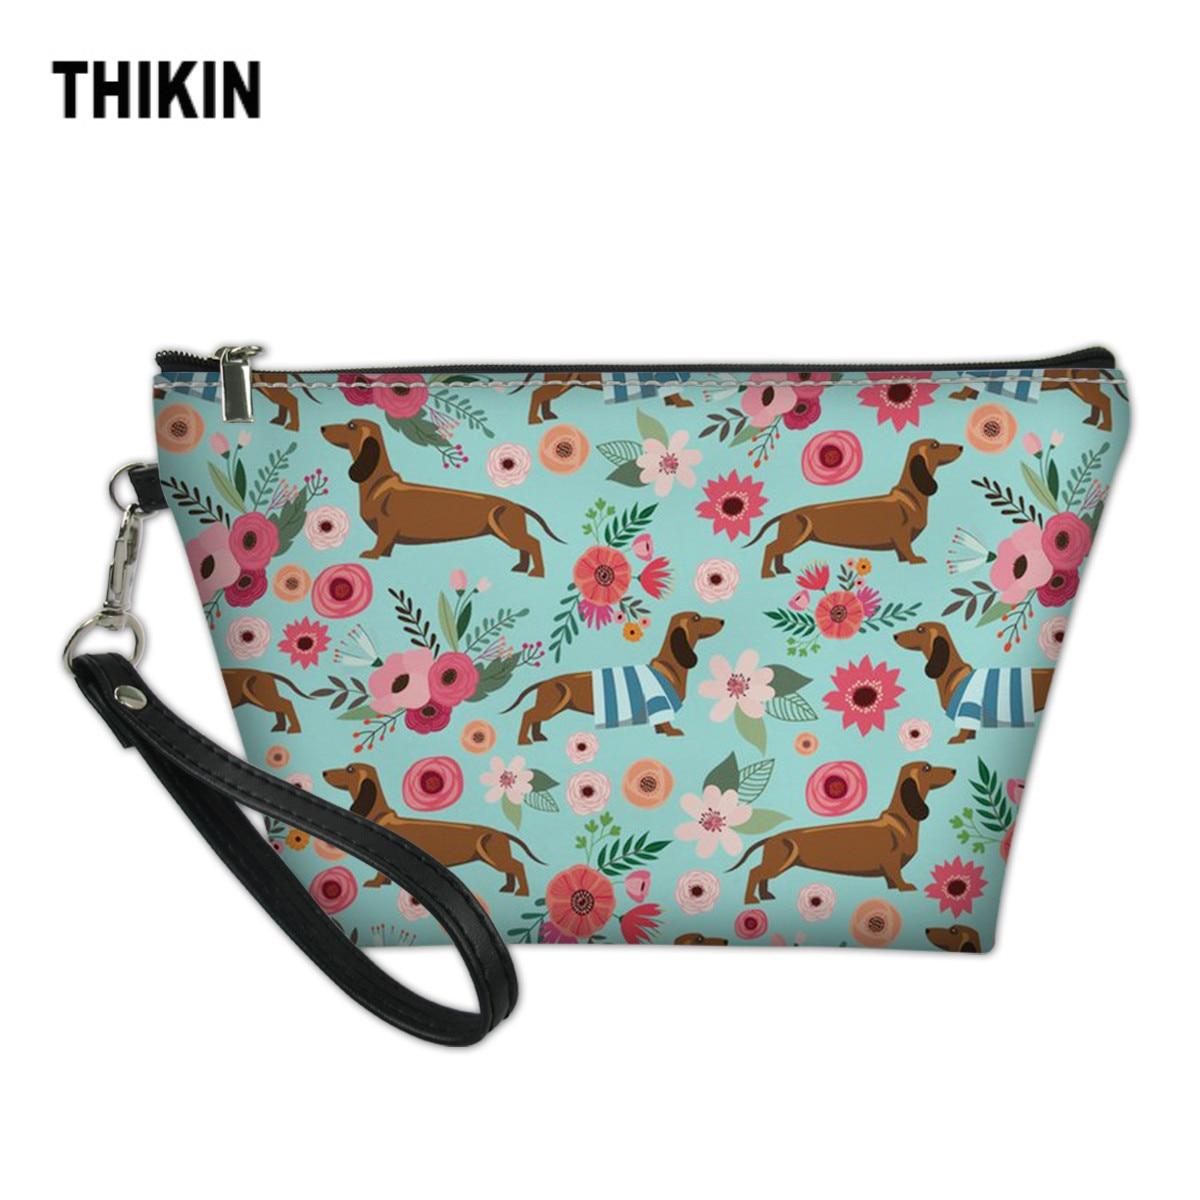 THIKIN Fashion Dachshund Dogs Print Women Makeup Bags Toiletries Organizer Cosmetic Bag Female Cases Custom Girls Make Up Box